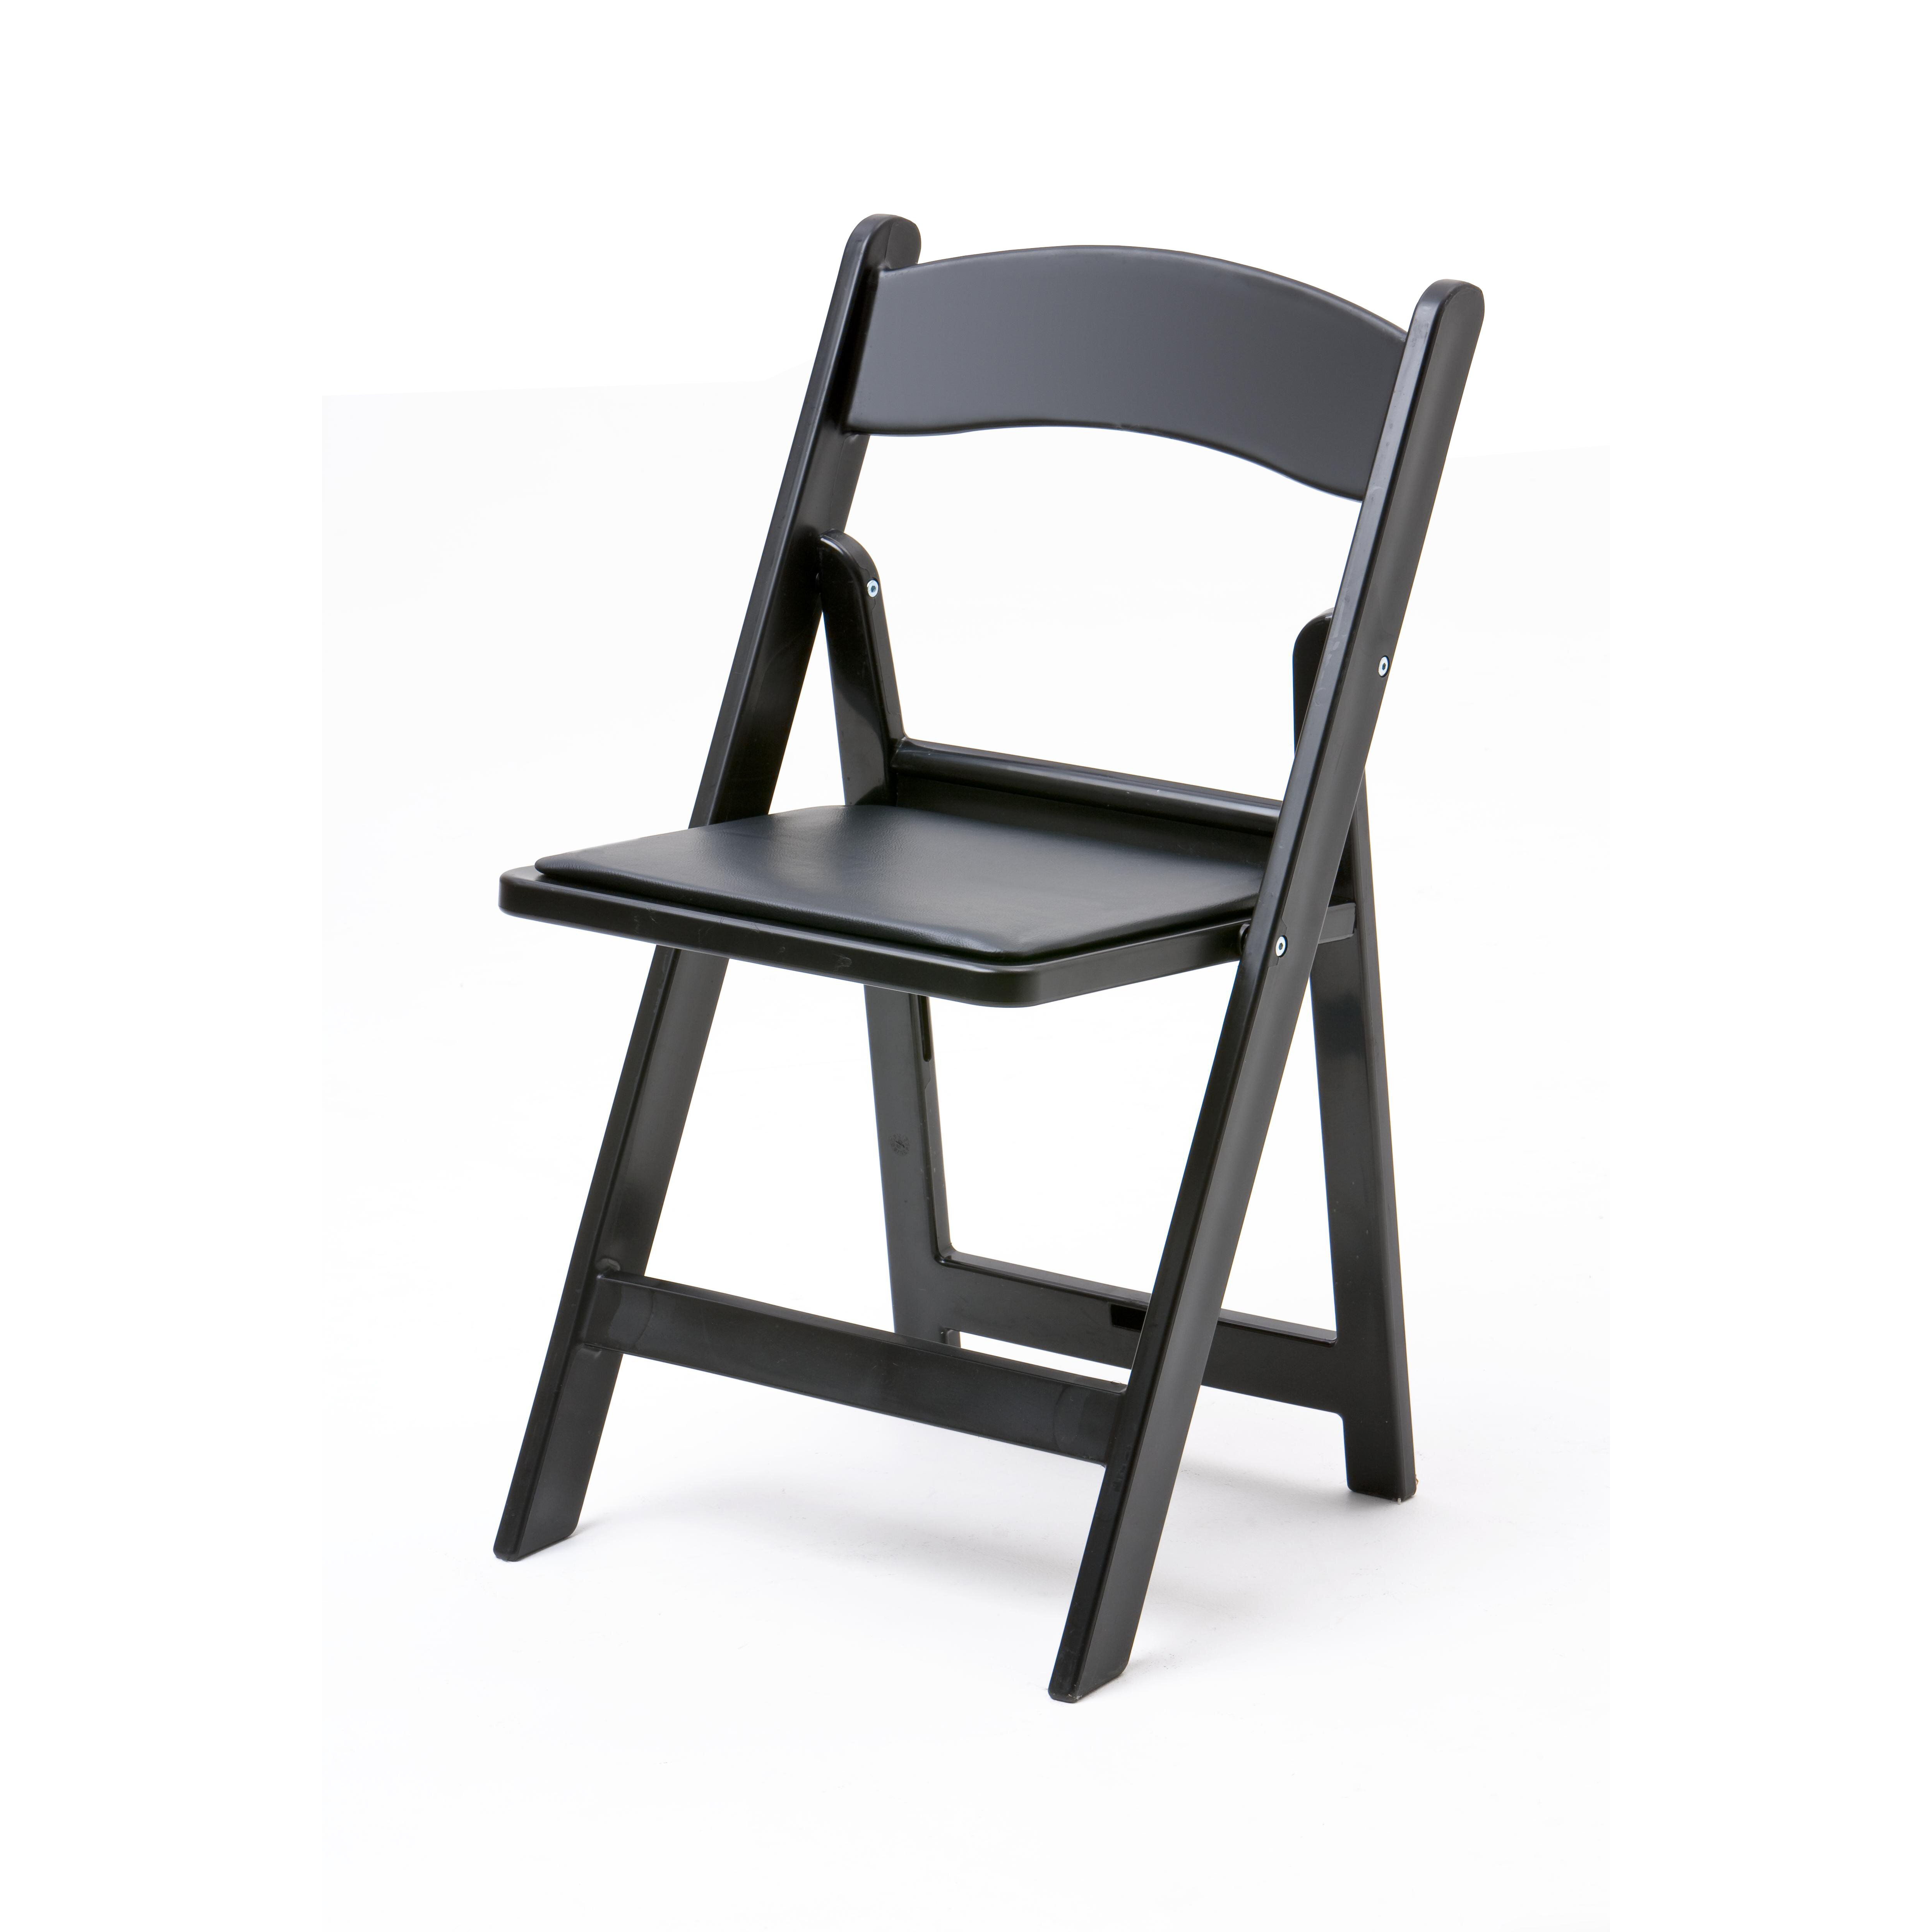 28 [ Mity Lite Chair Tree ]